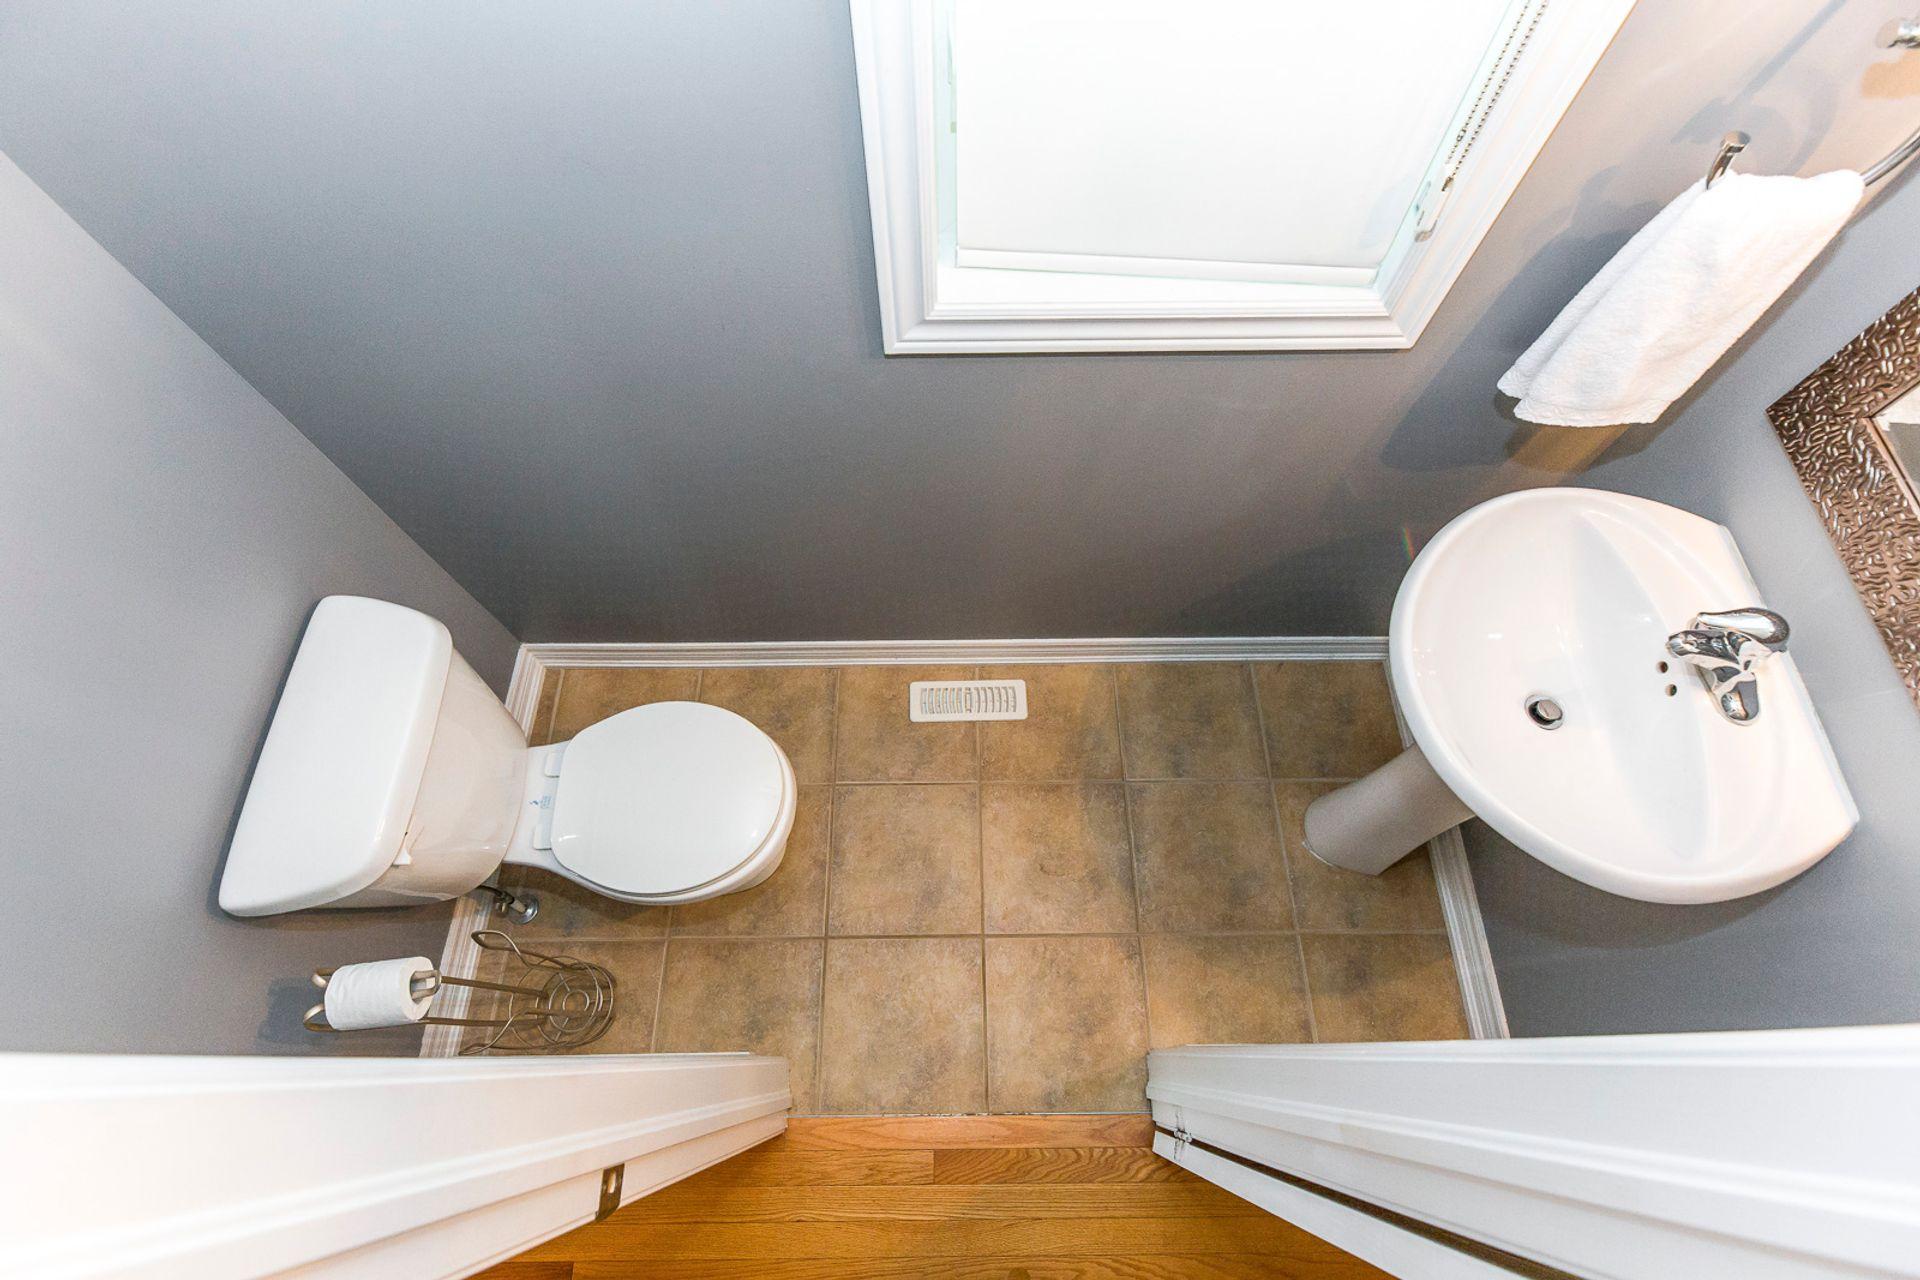 Powder Room - 3720 Nightstar Dr, Mississauga - Elite3 & Team at 3720 Nightstar Drive, Churchill Meadows, Mississauga